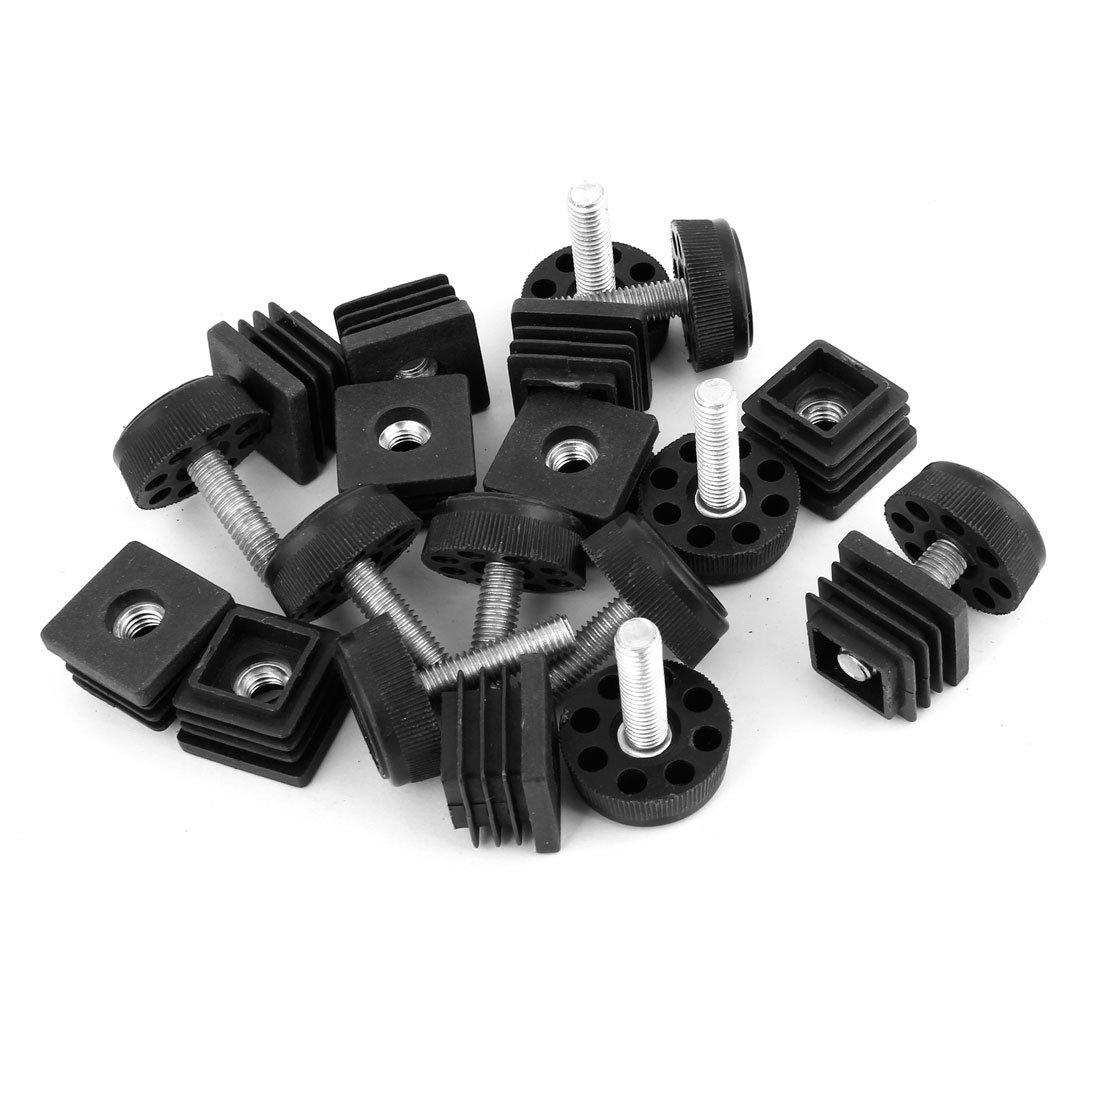 Sourcingmap Quadratische Verstellbare Fu/ßkappen-Set 10 Sets 25 mm x 25 mm 30 mm Bodendurchmesser